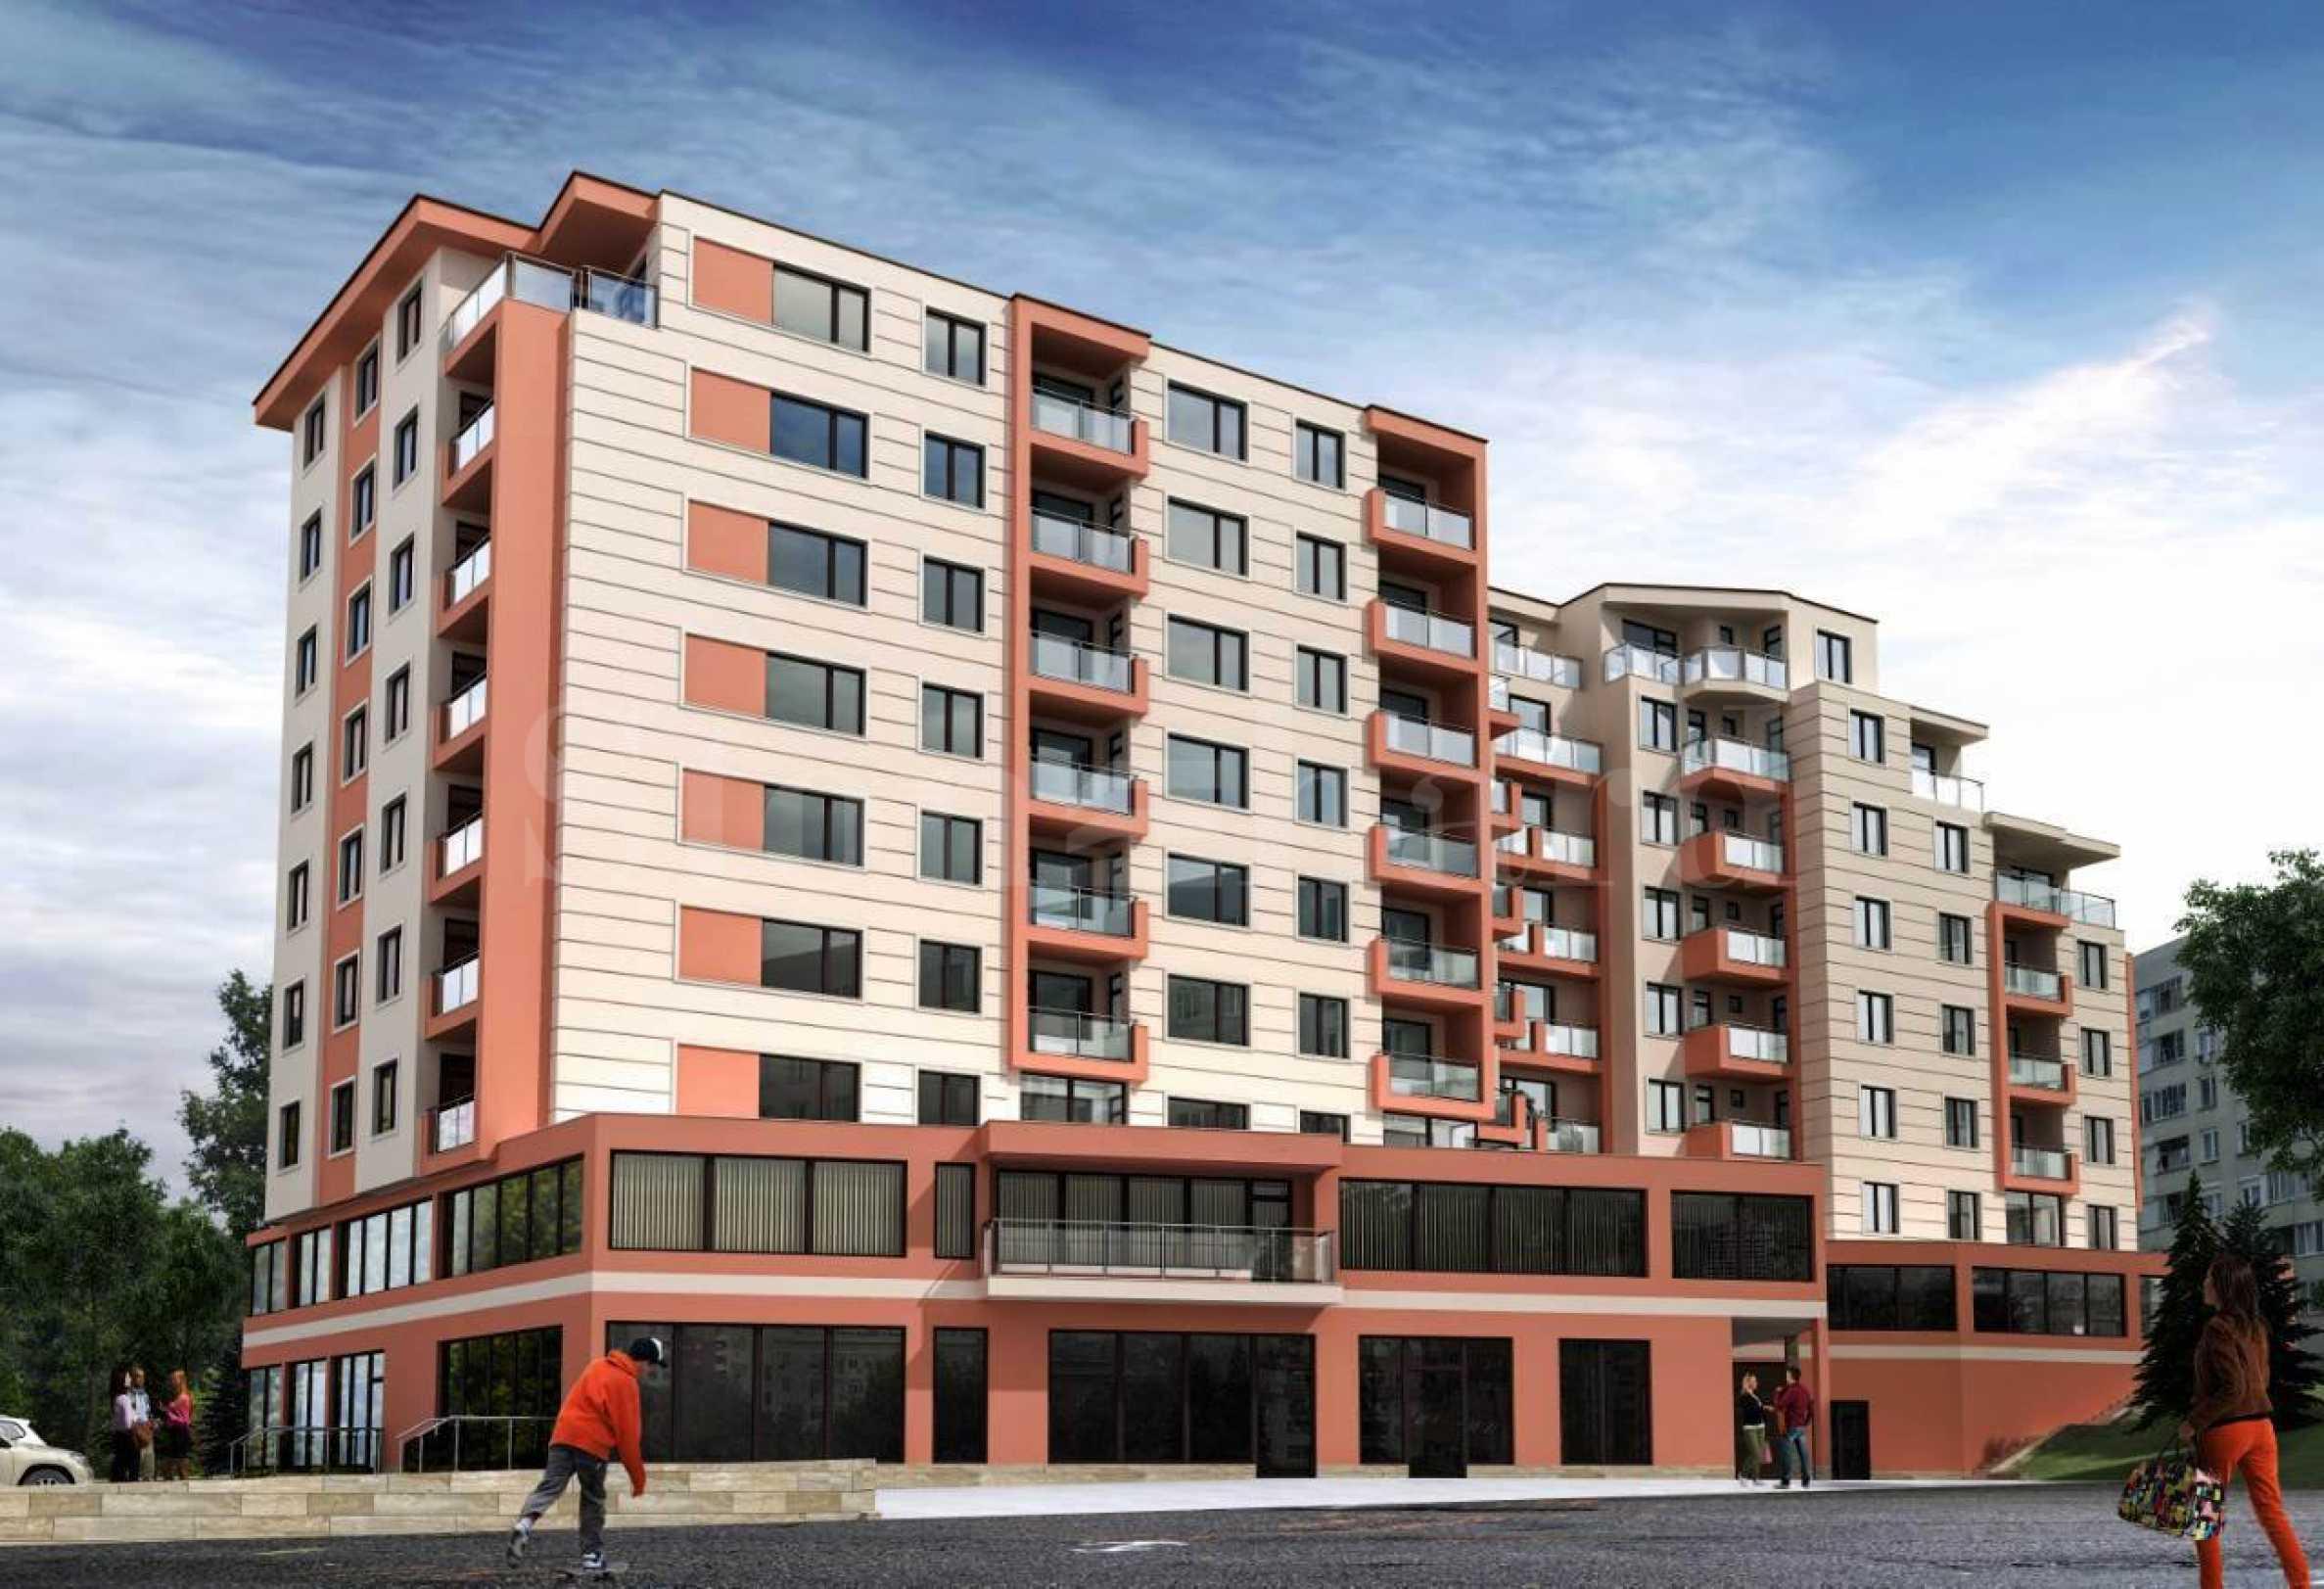 Различни типове апартаменти в нова сграда в кв. Трошево1 - Stonehard